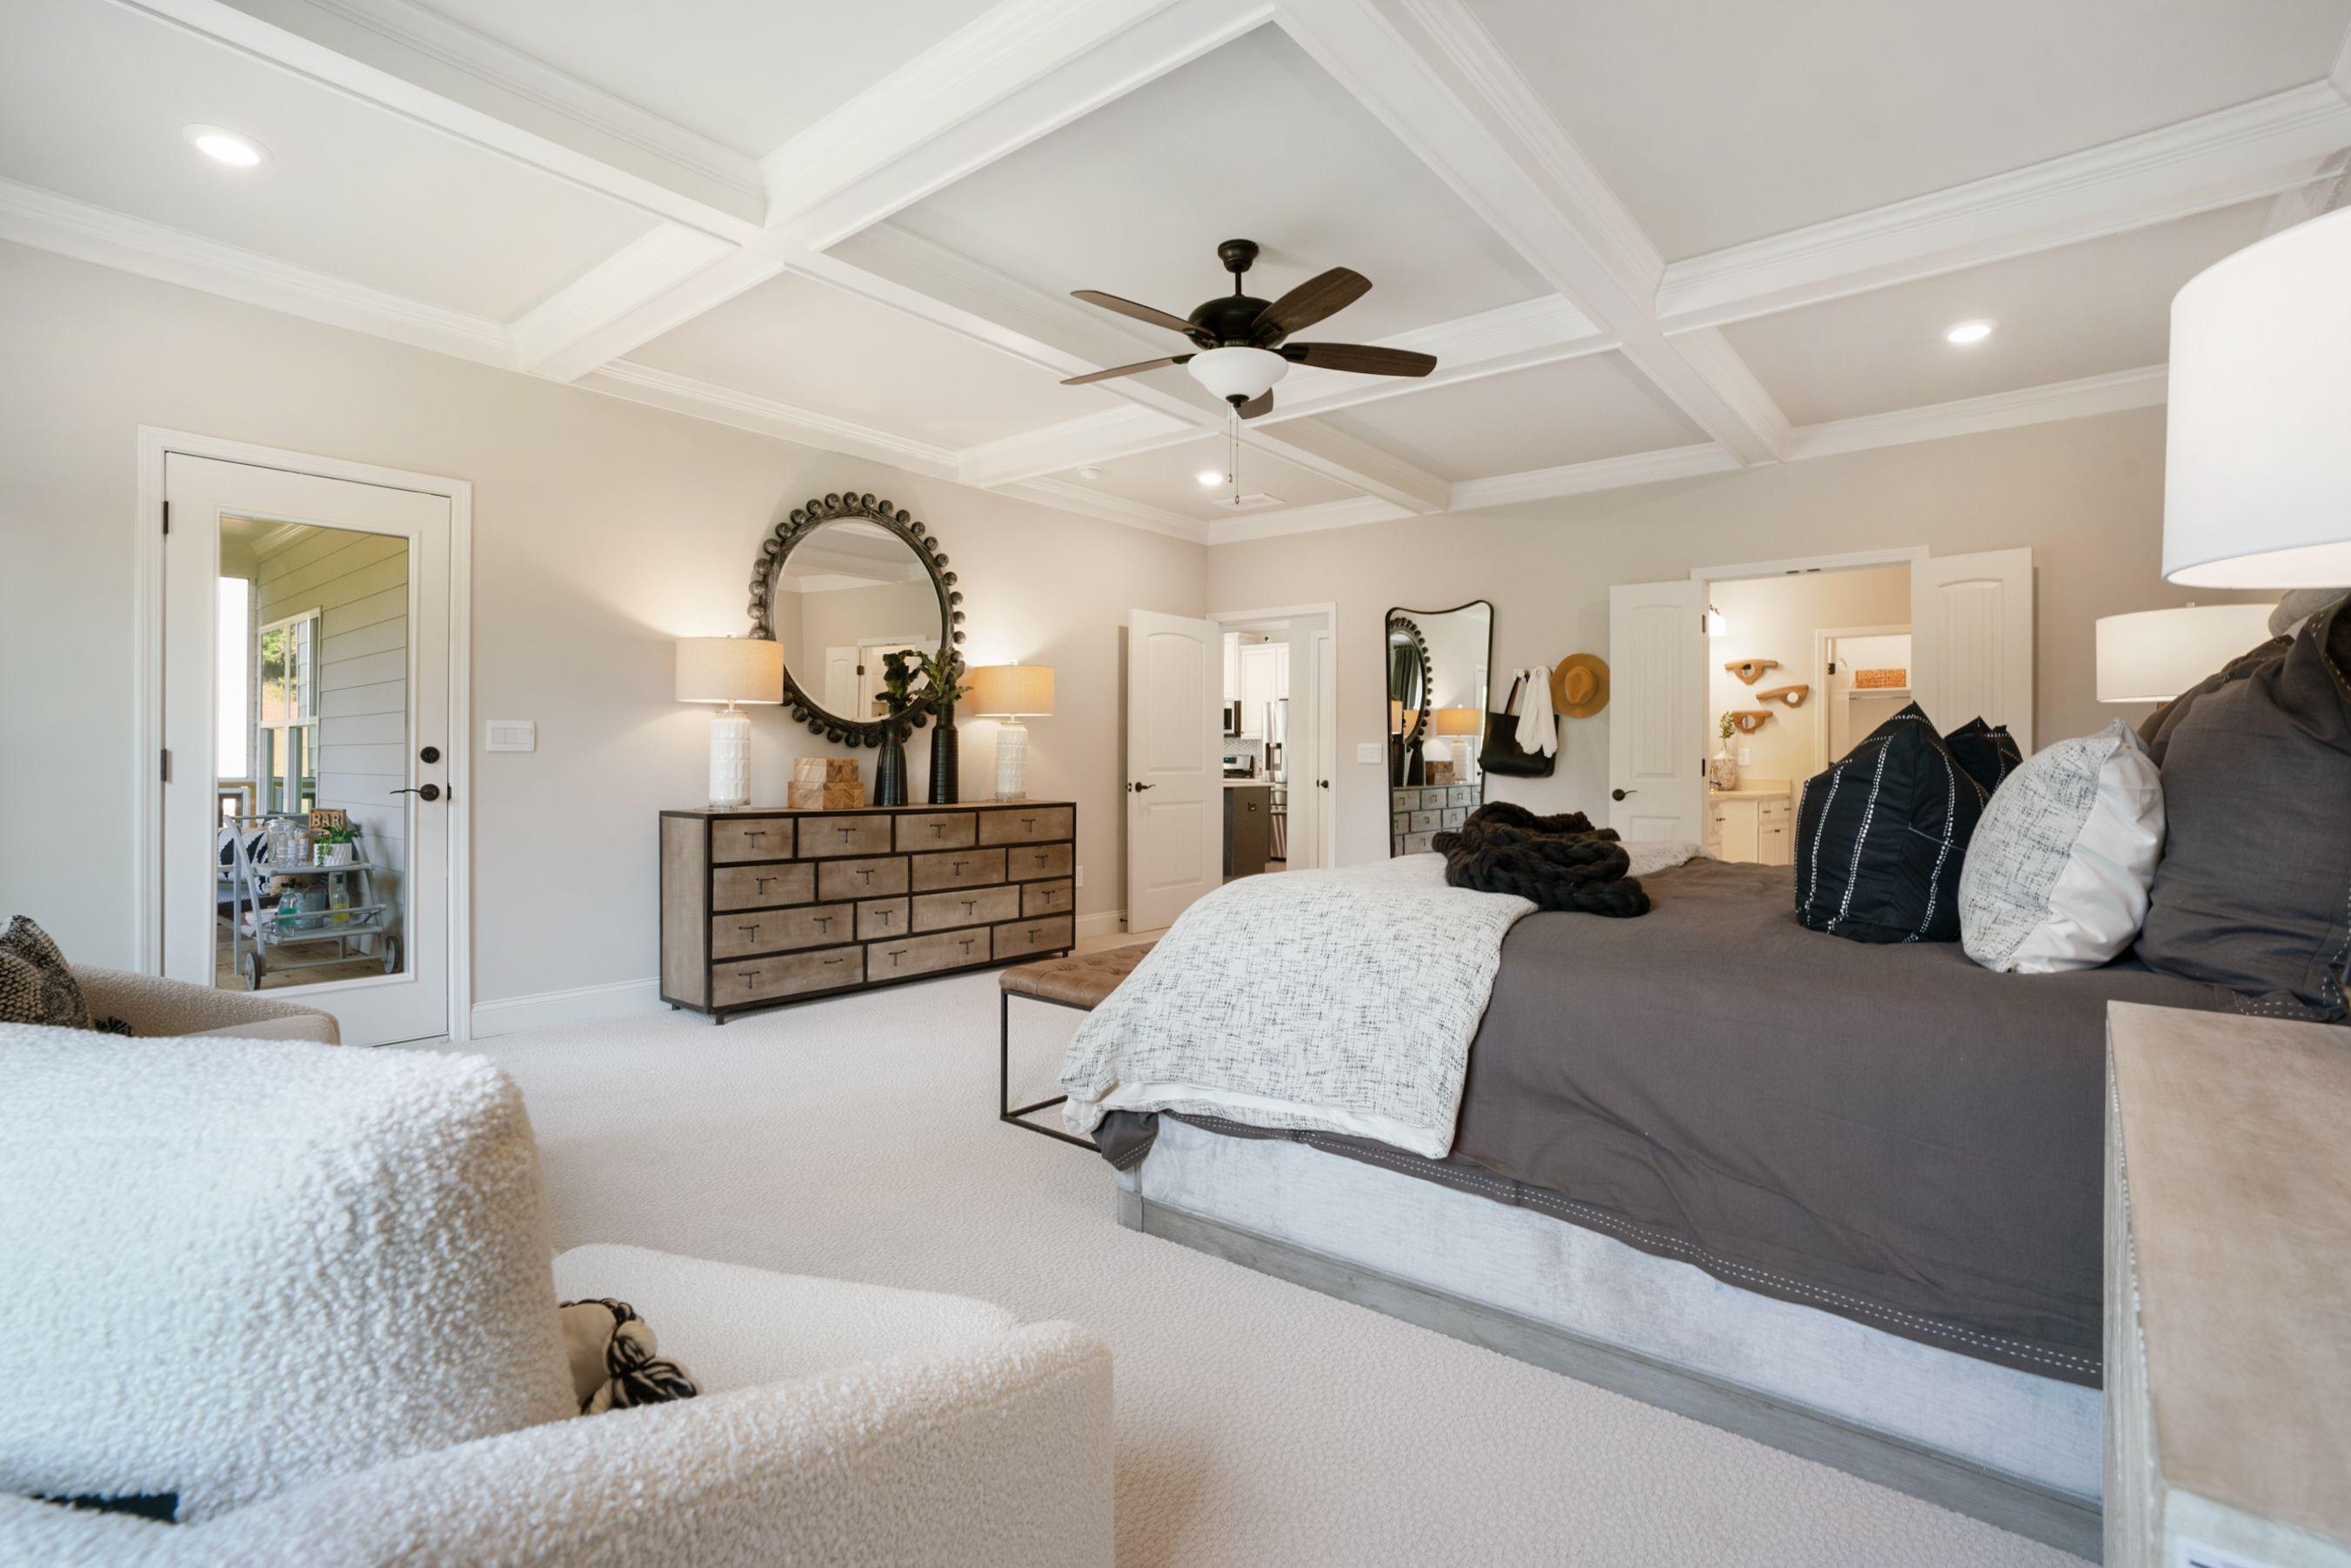 Bedroom featured in the Rabun (Active Adult) By Artisan Built Communities in Atlanta, GA